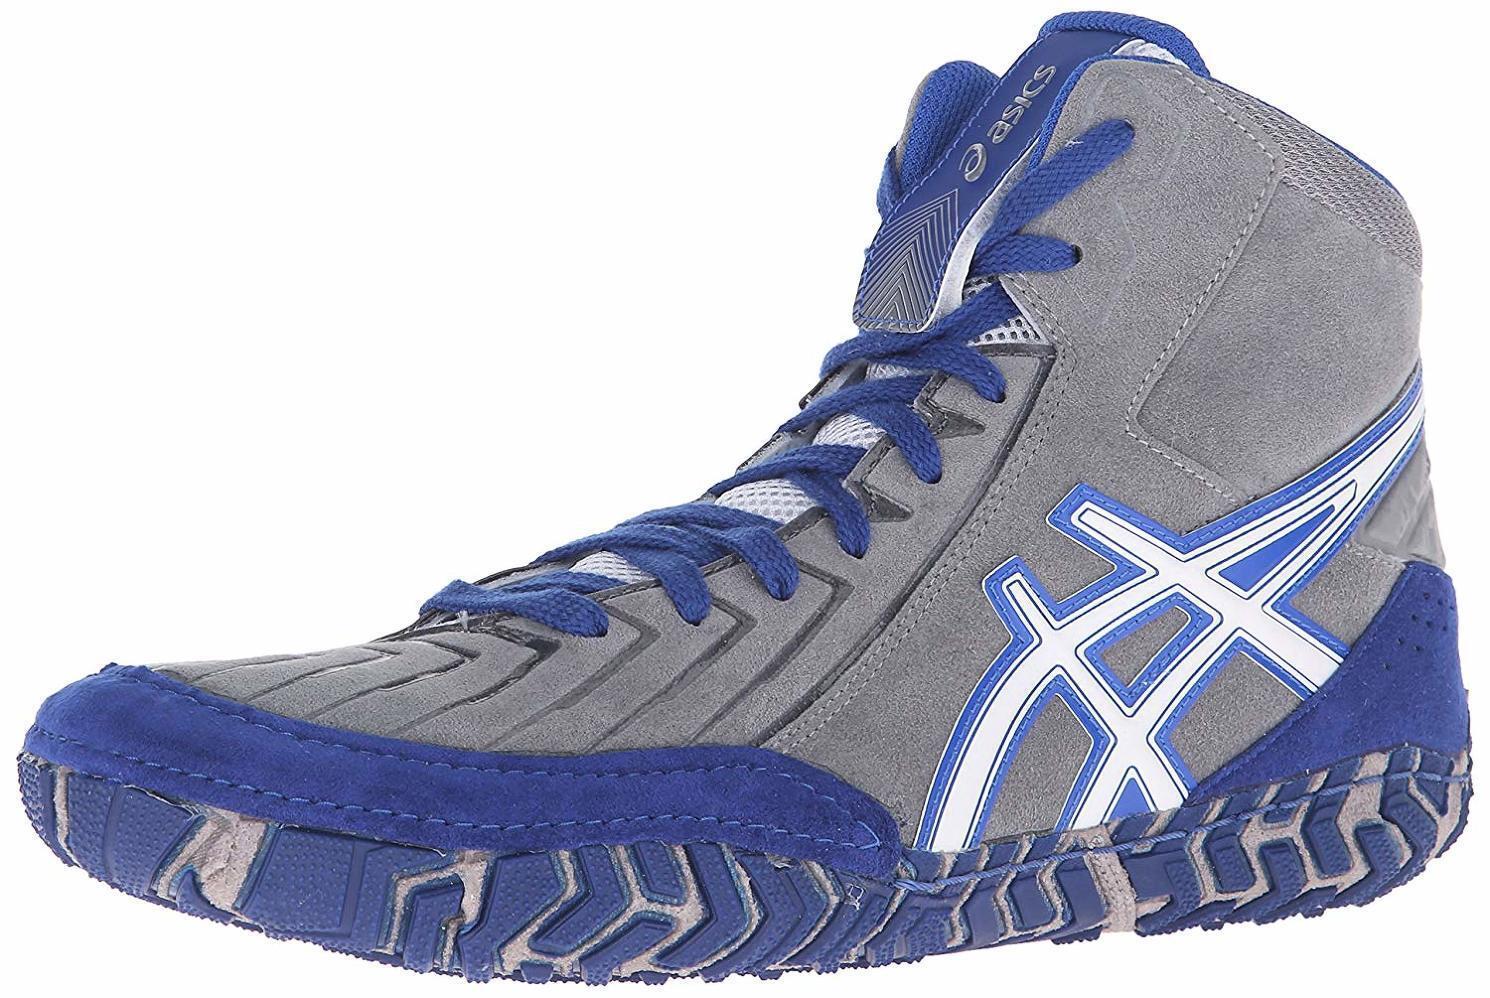 ASICS 3 Mens Aggressor 3 ASICS Wrestling Shoe, - Choose SZ/Color 296718